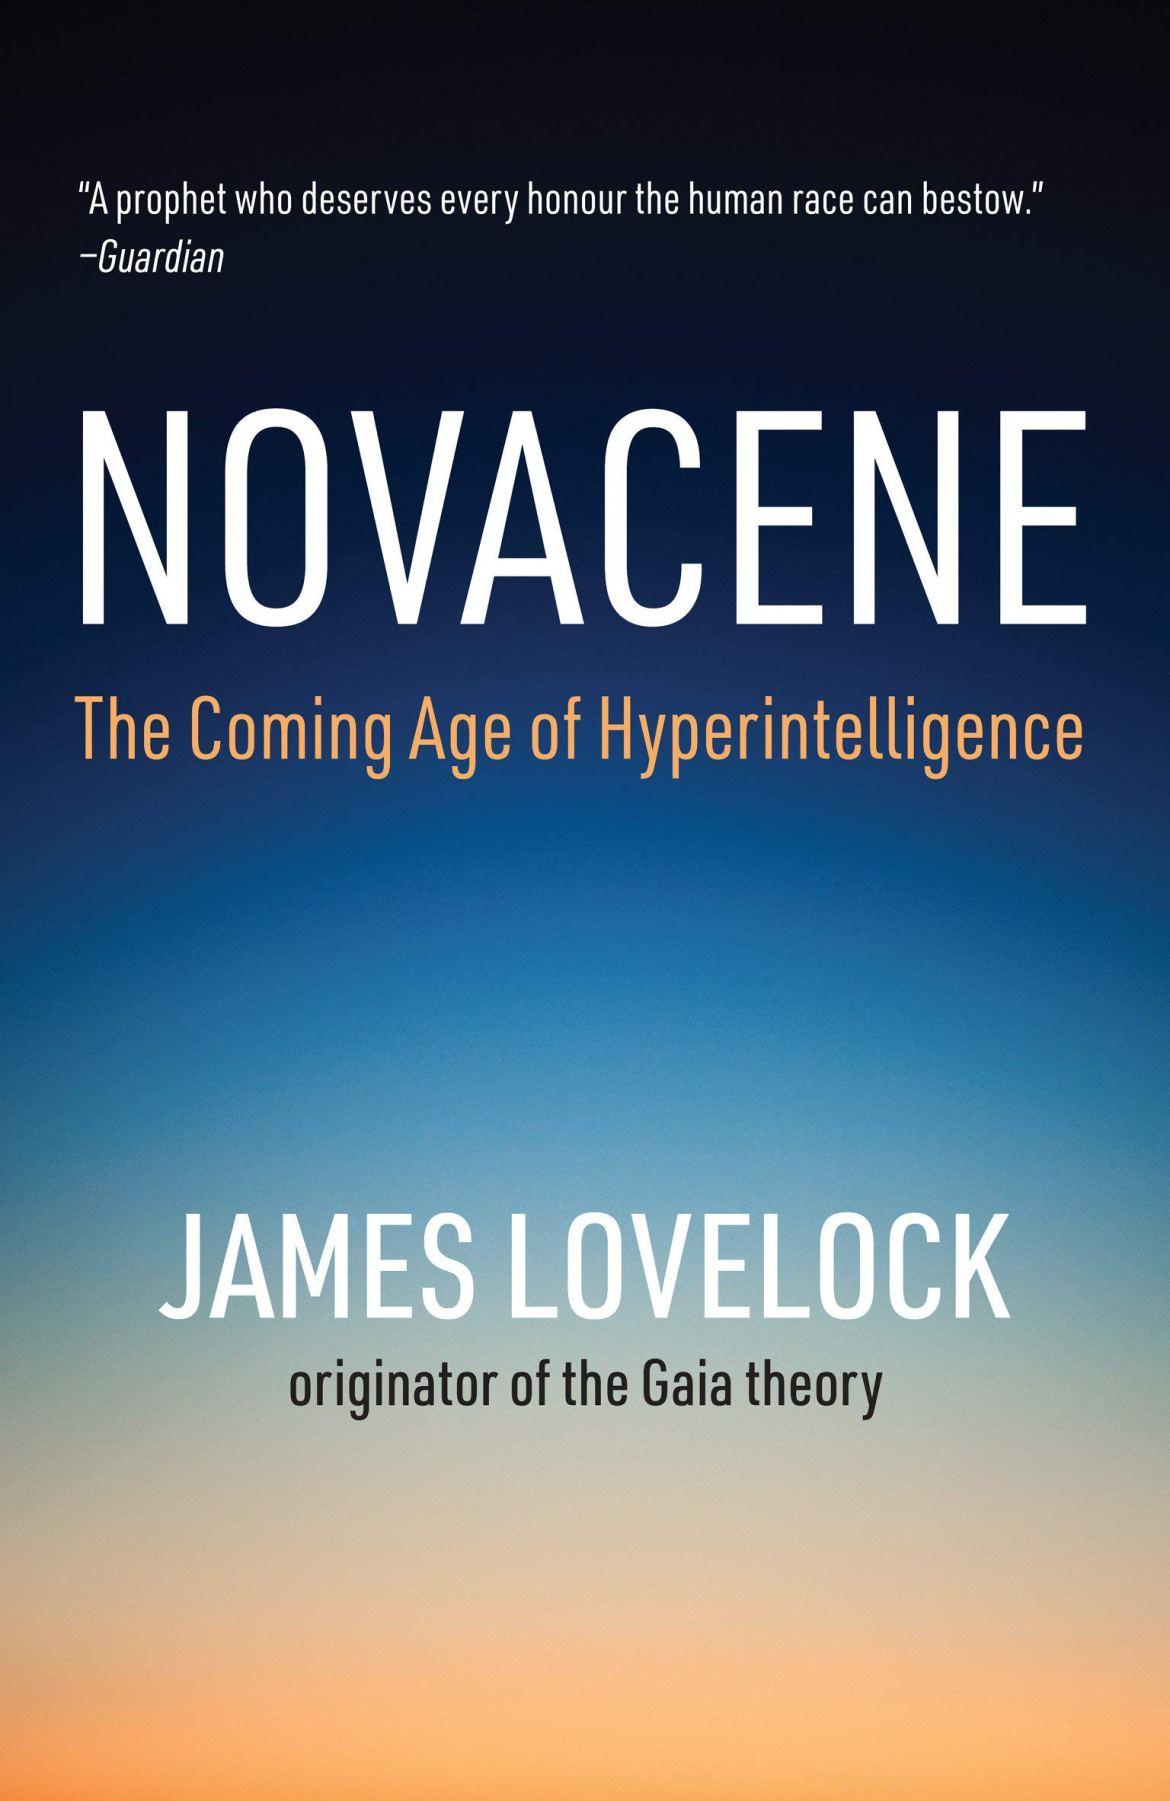 Novacene: The Coming Age of Hyperintelligence (Mit Press): Lovelock, James:  9780262539517: Amazon.com: Books